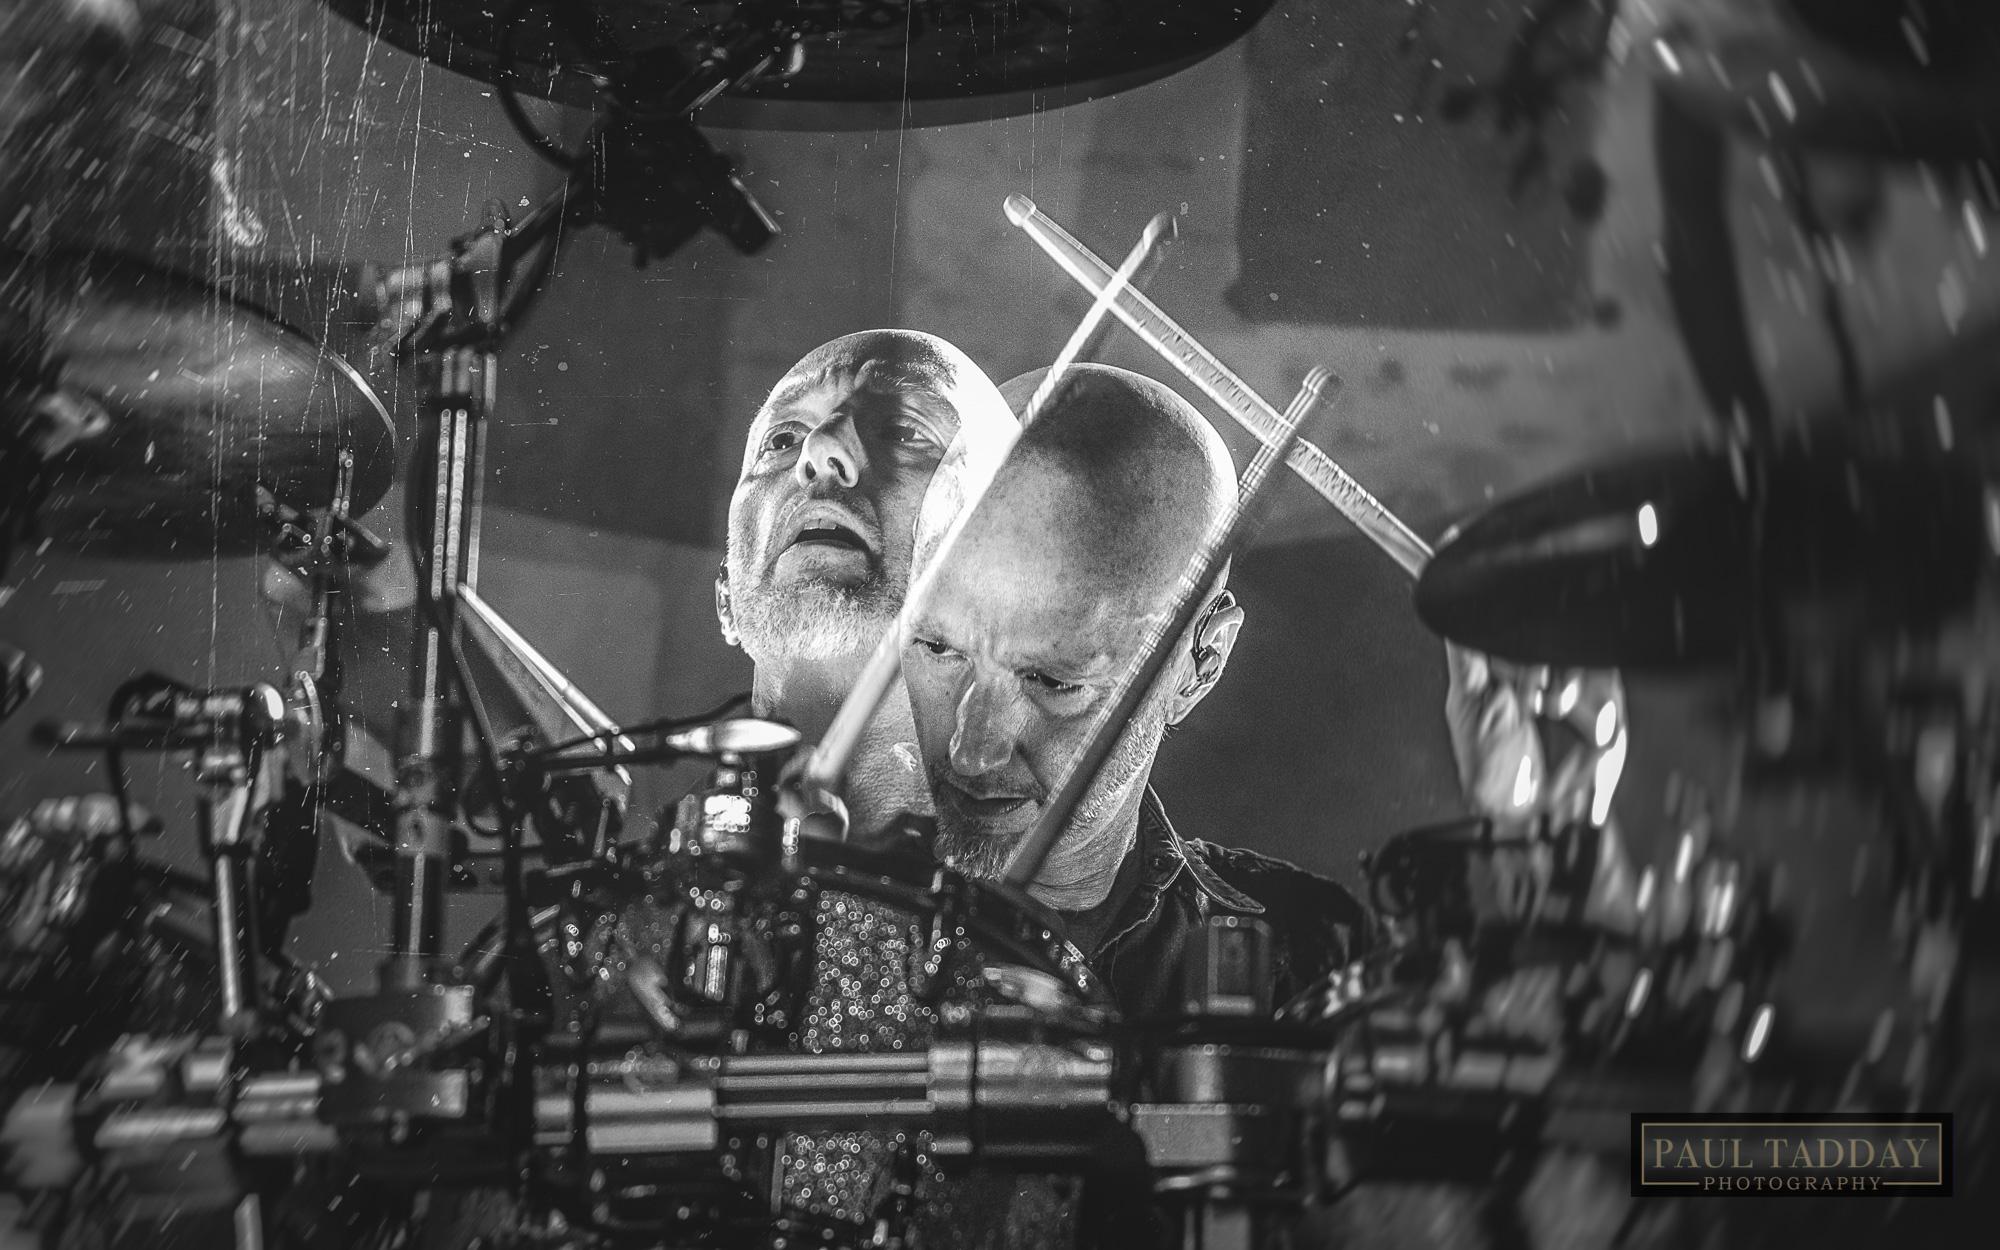 MachineHead-2018-PaulTaddayPhotography-050.jpg